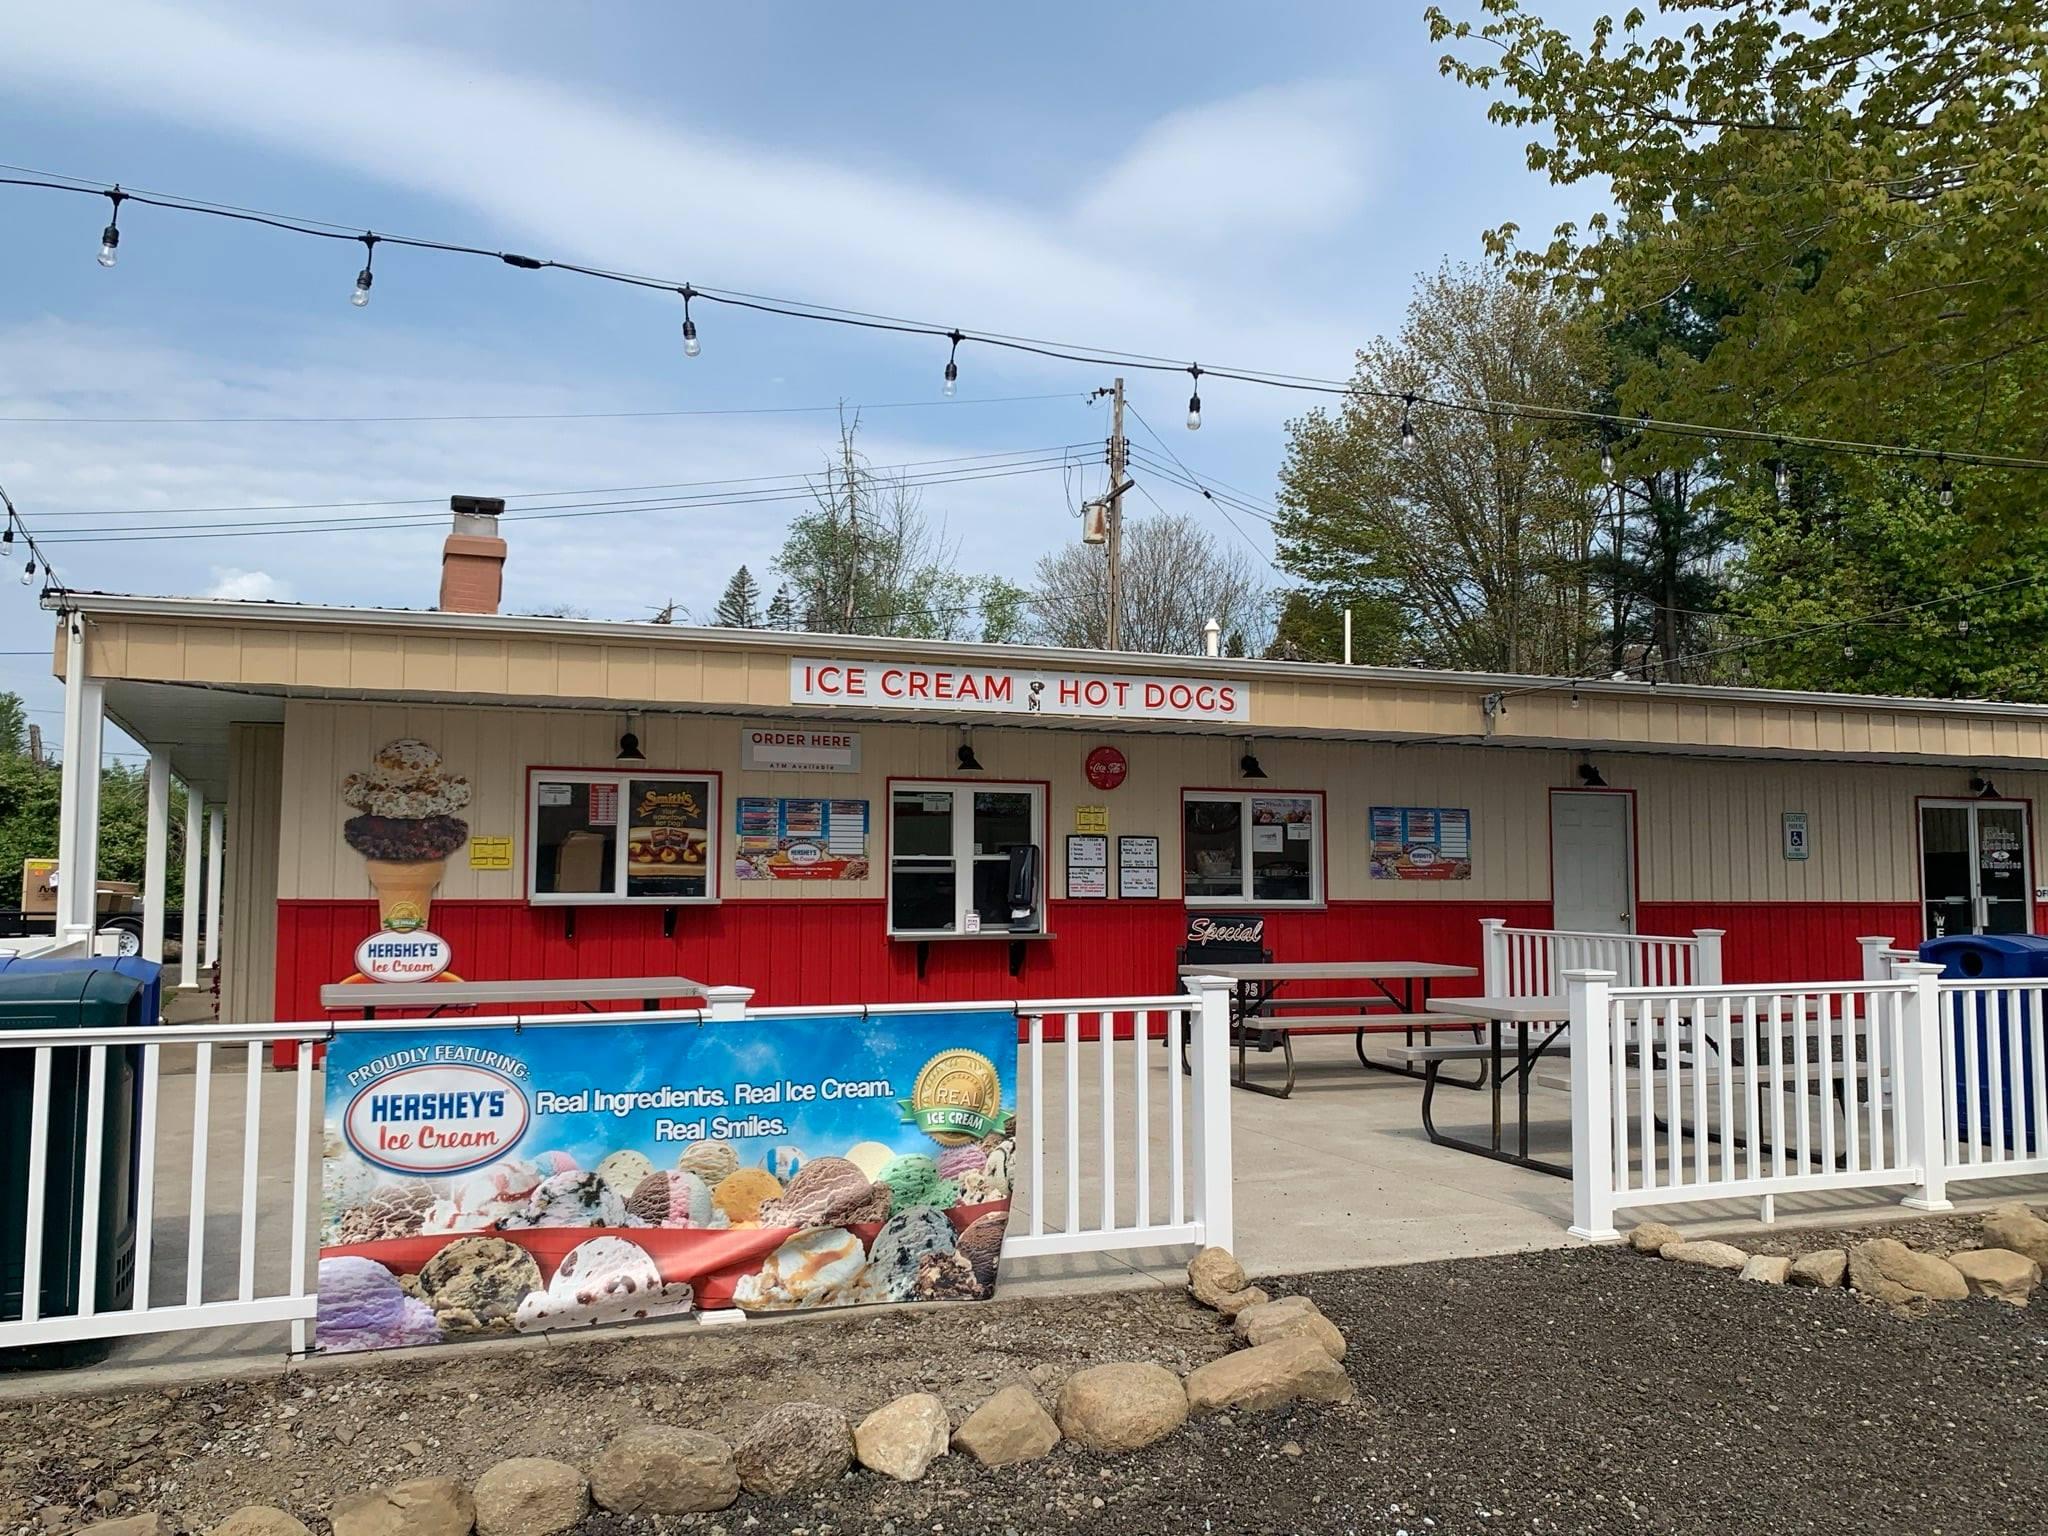 Rowdy's Ice Cream & Hot Dogs